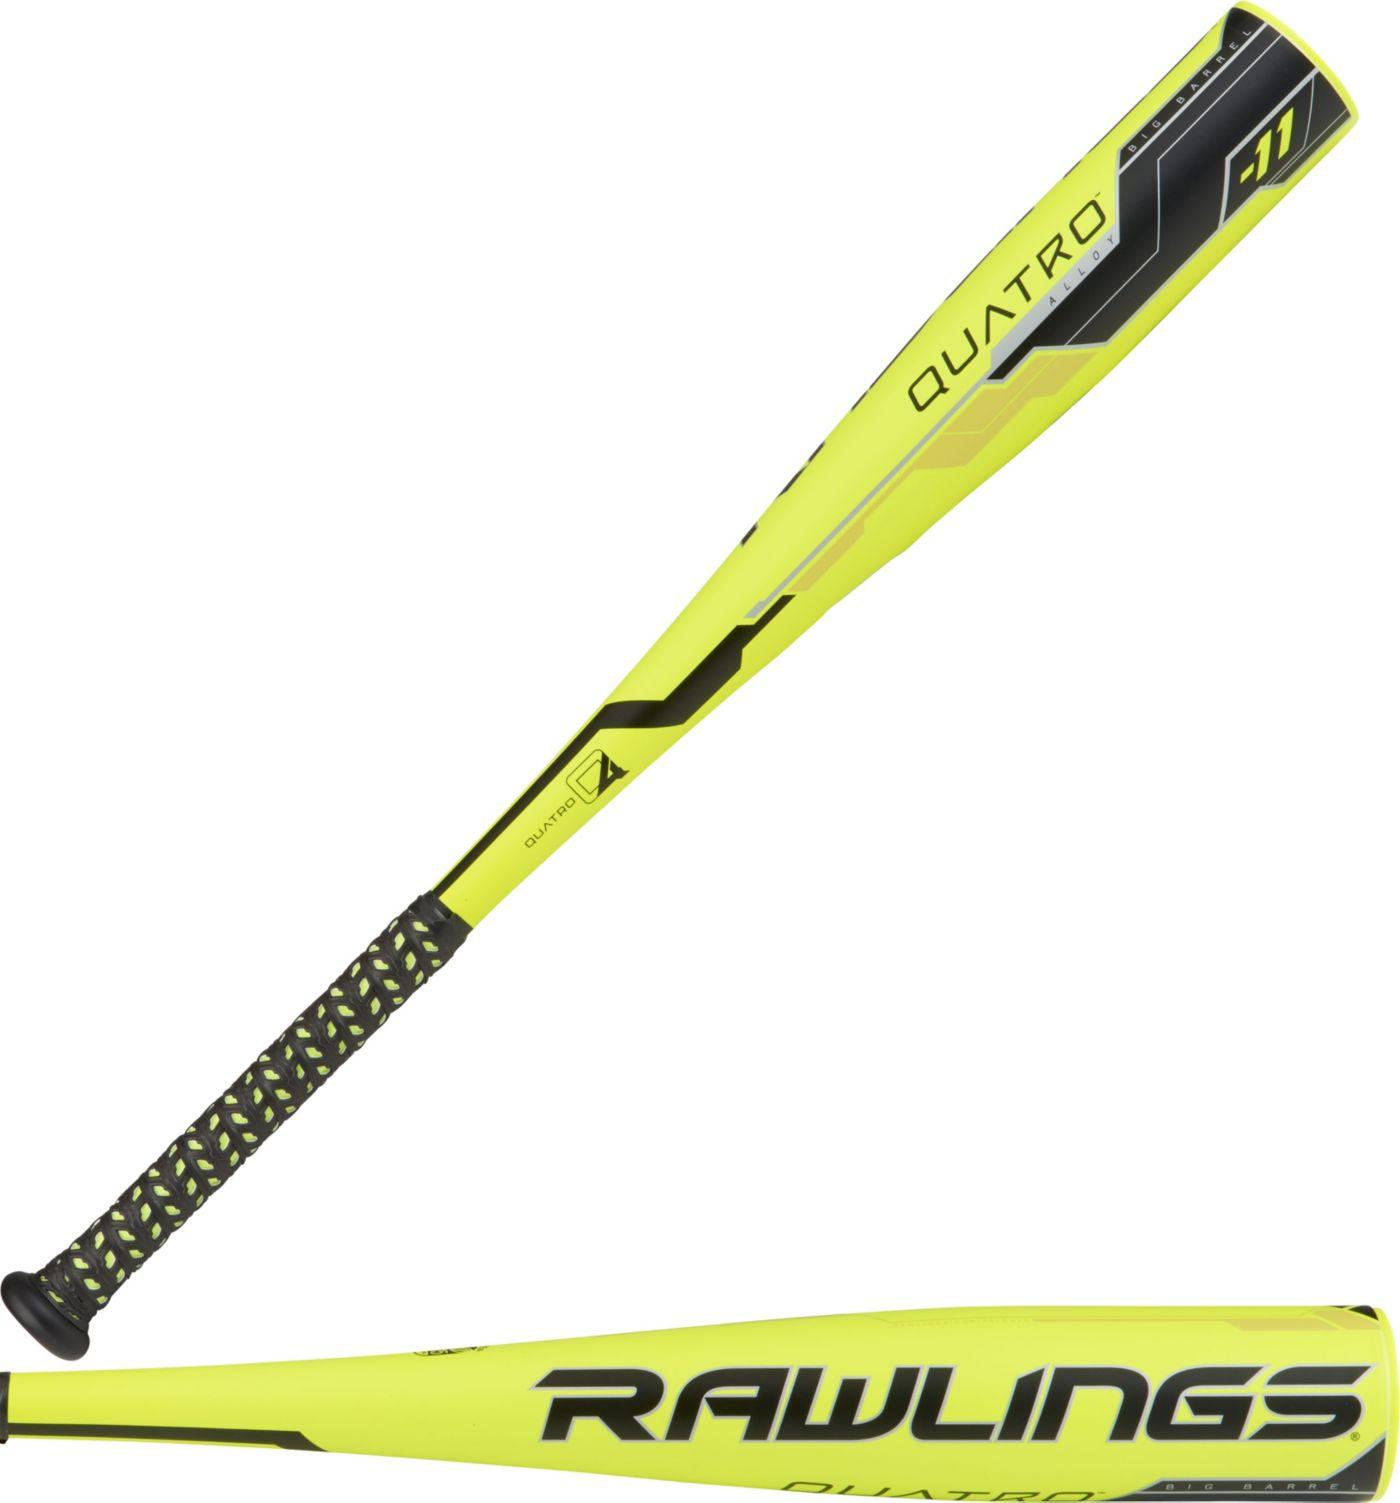 Rawlings Quatro USSSA Bat 2018 (-11)